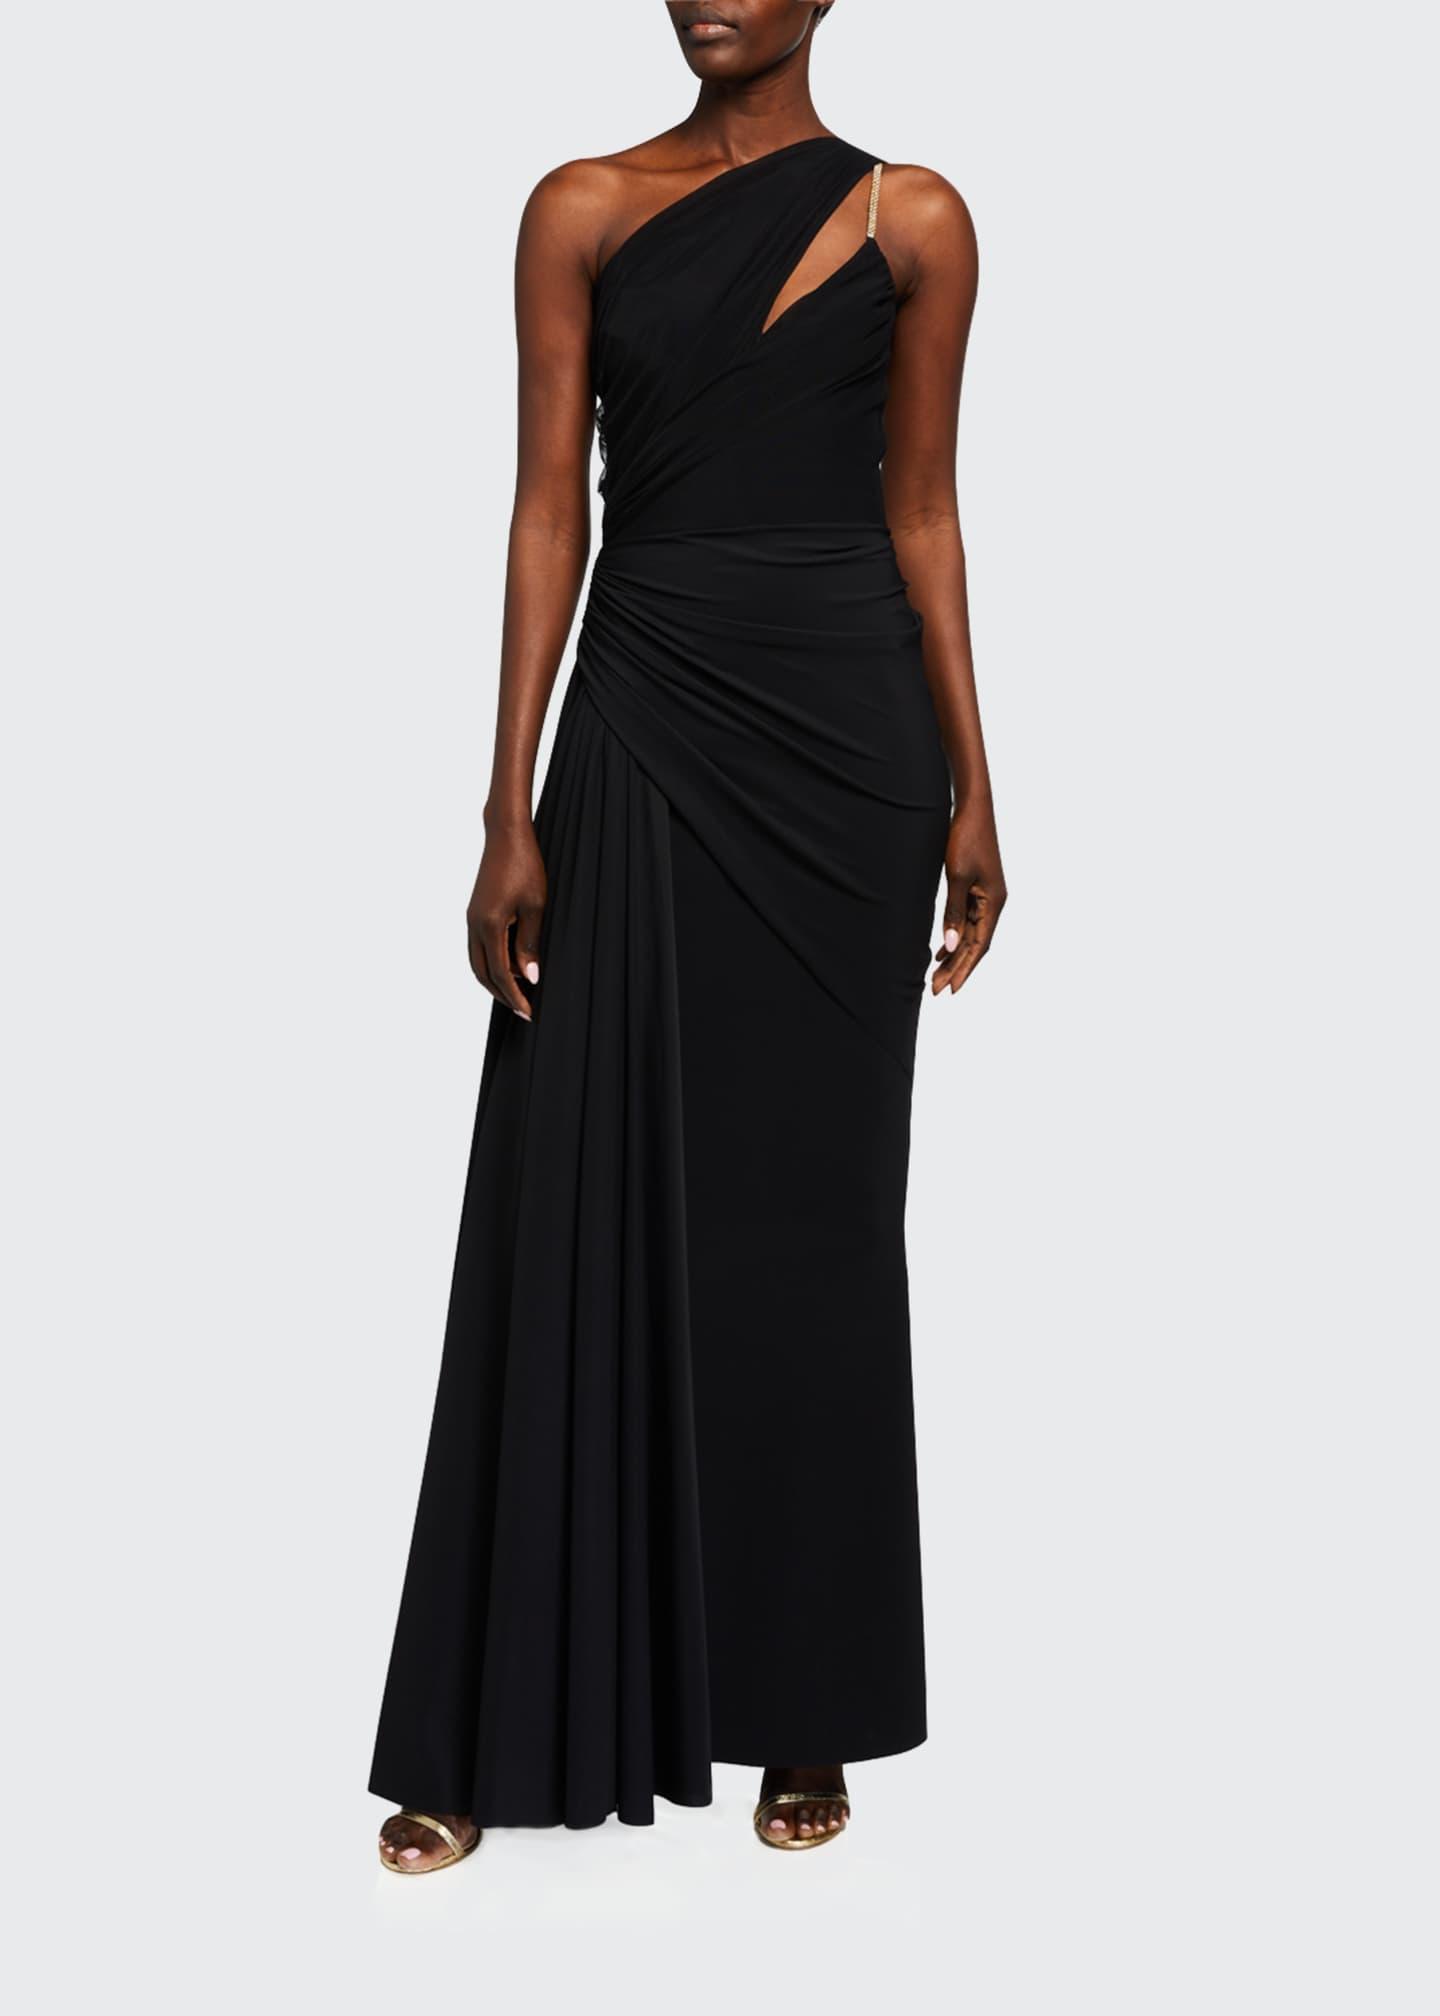 Chiara Boni La Petite Robe Kirin One Shoulder Draped Gown Bergdorf Goodman